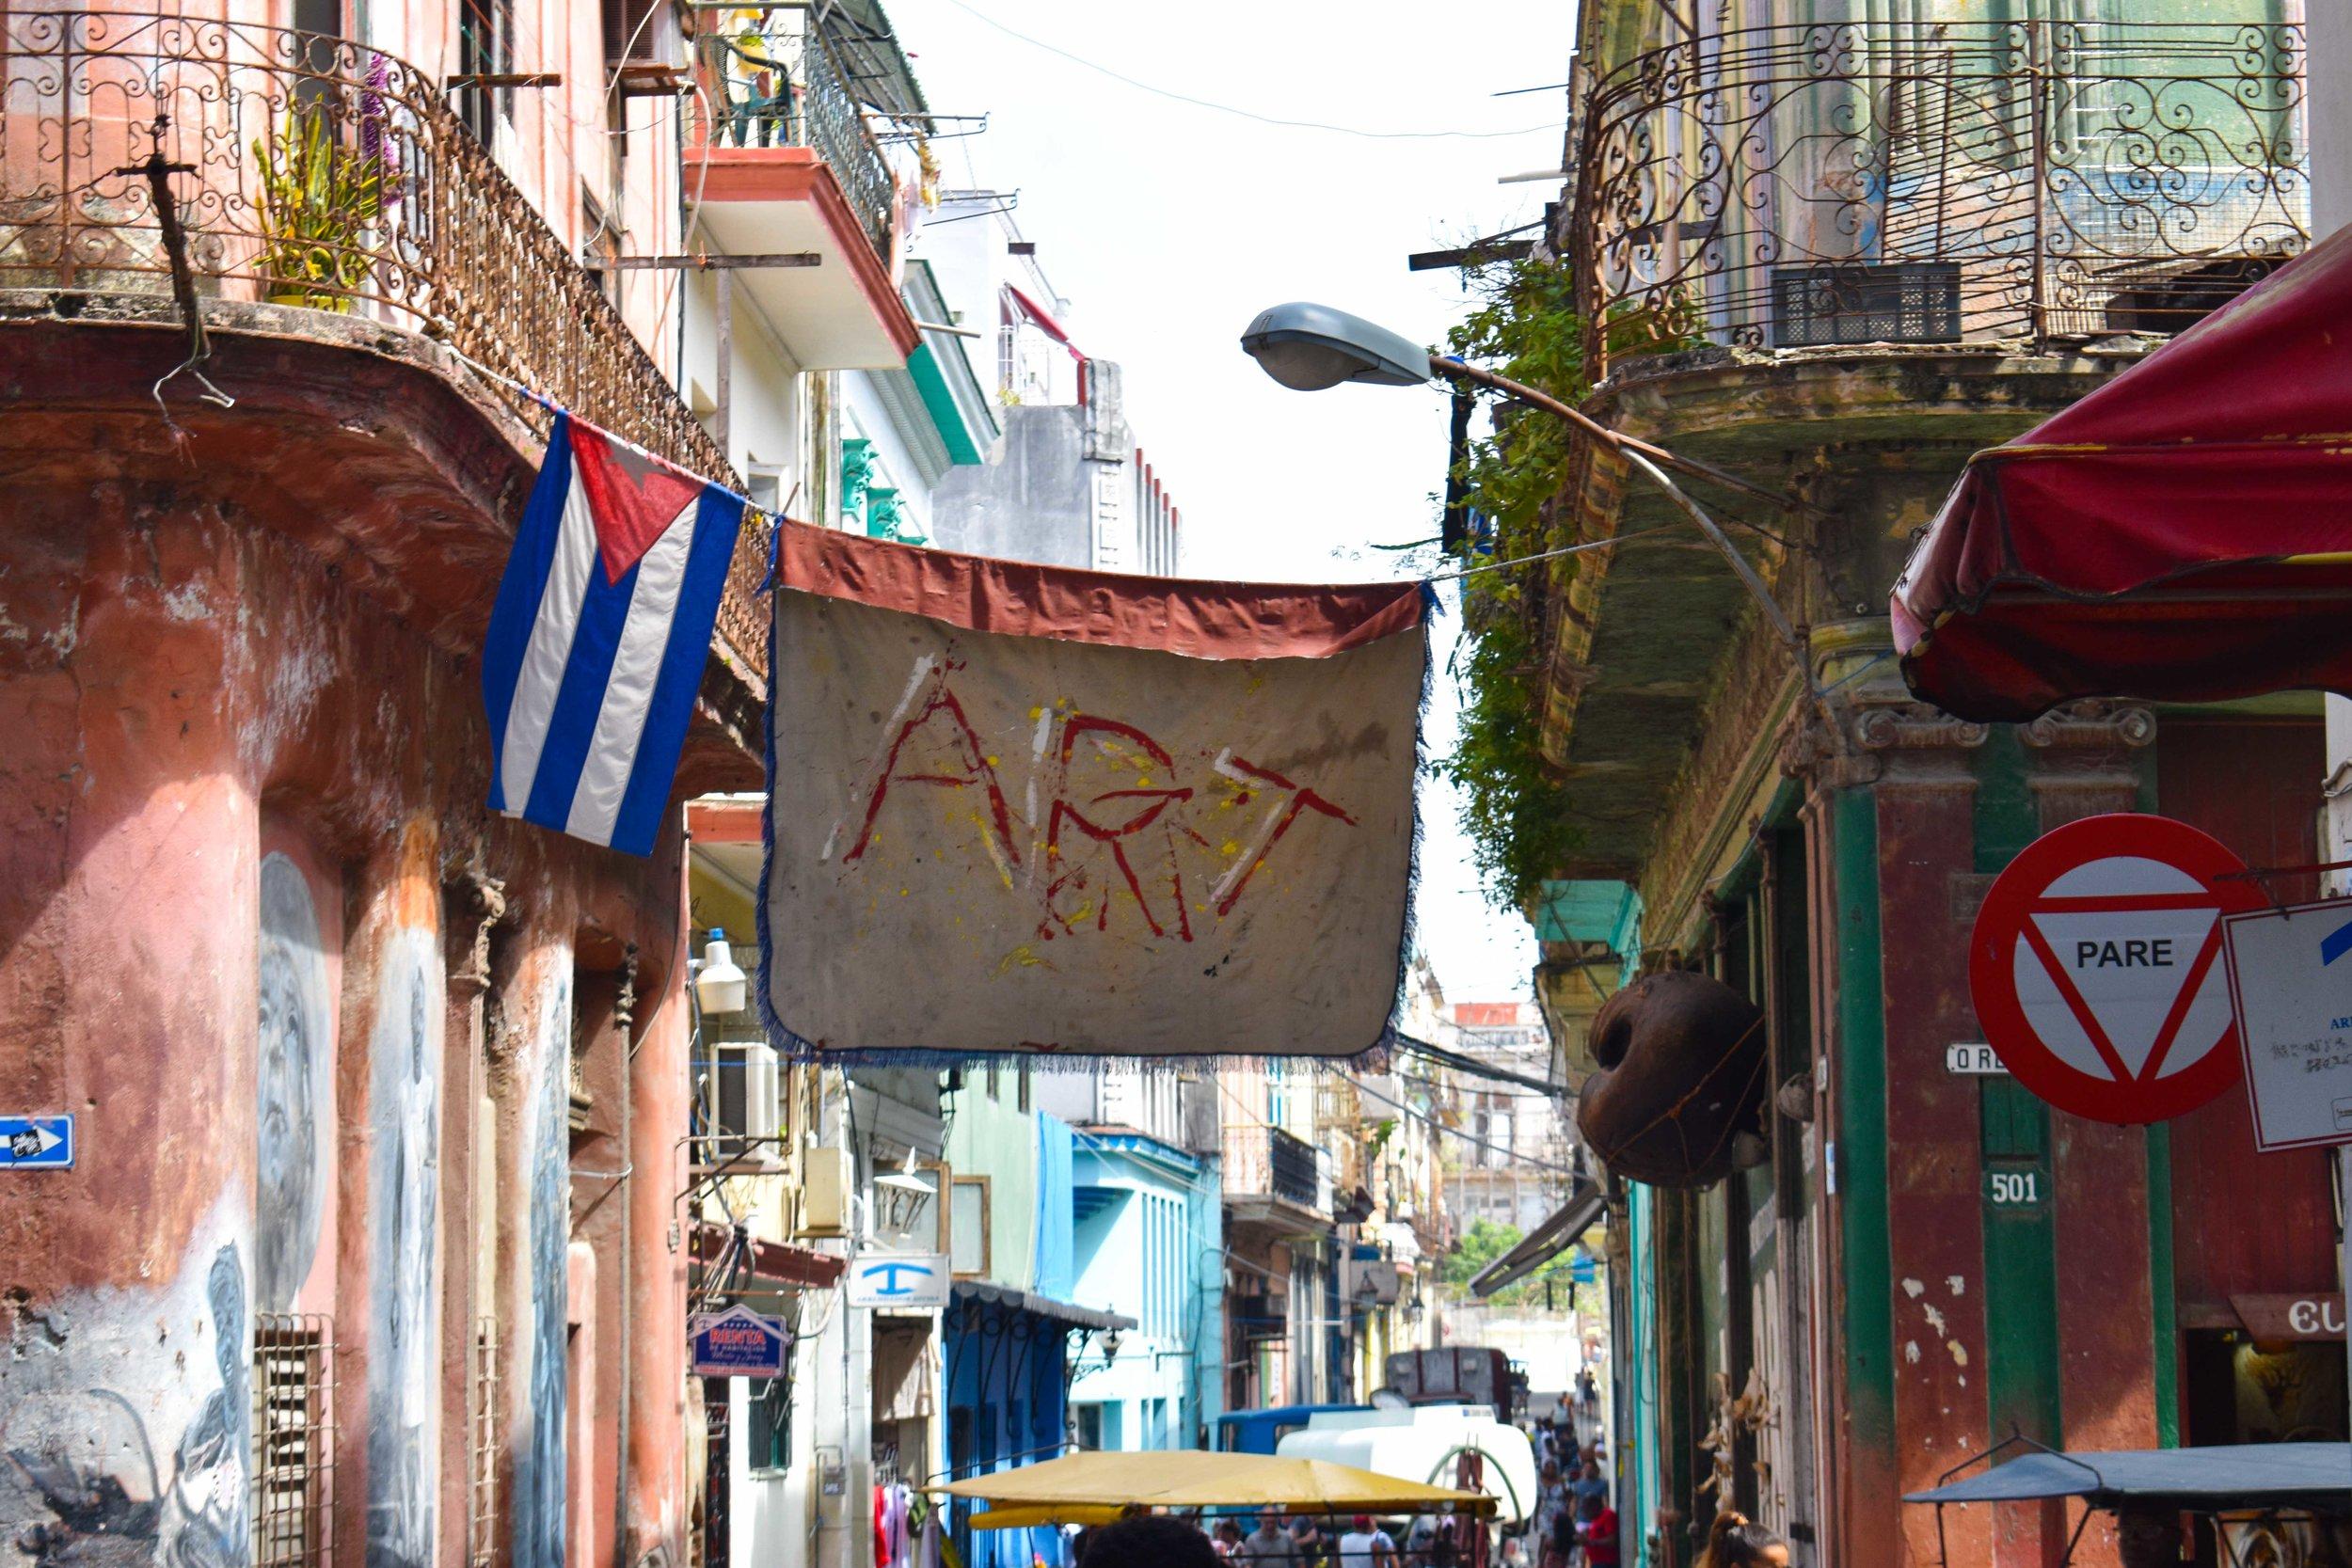 gregsstyleguide havana cuba travel blog